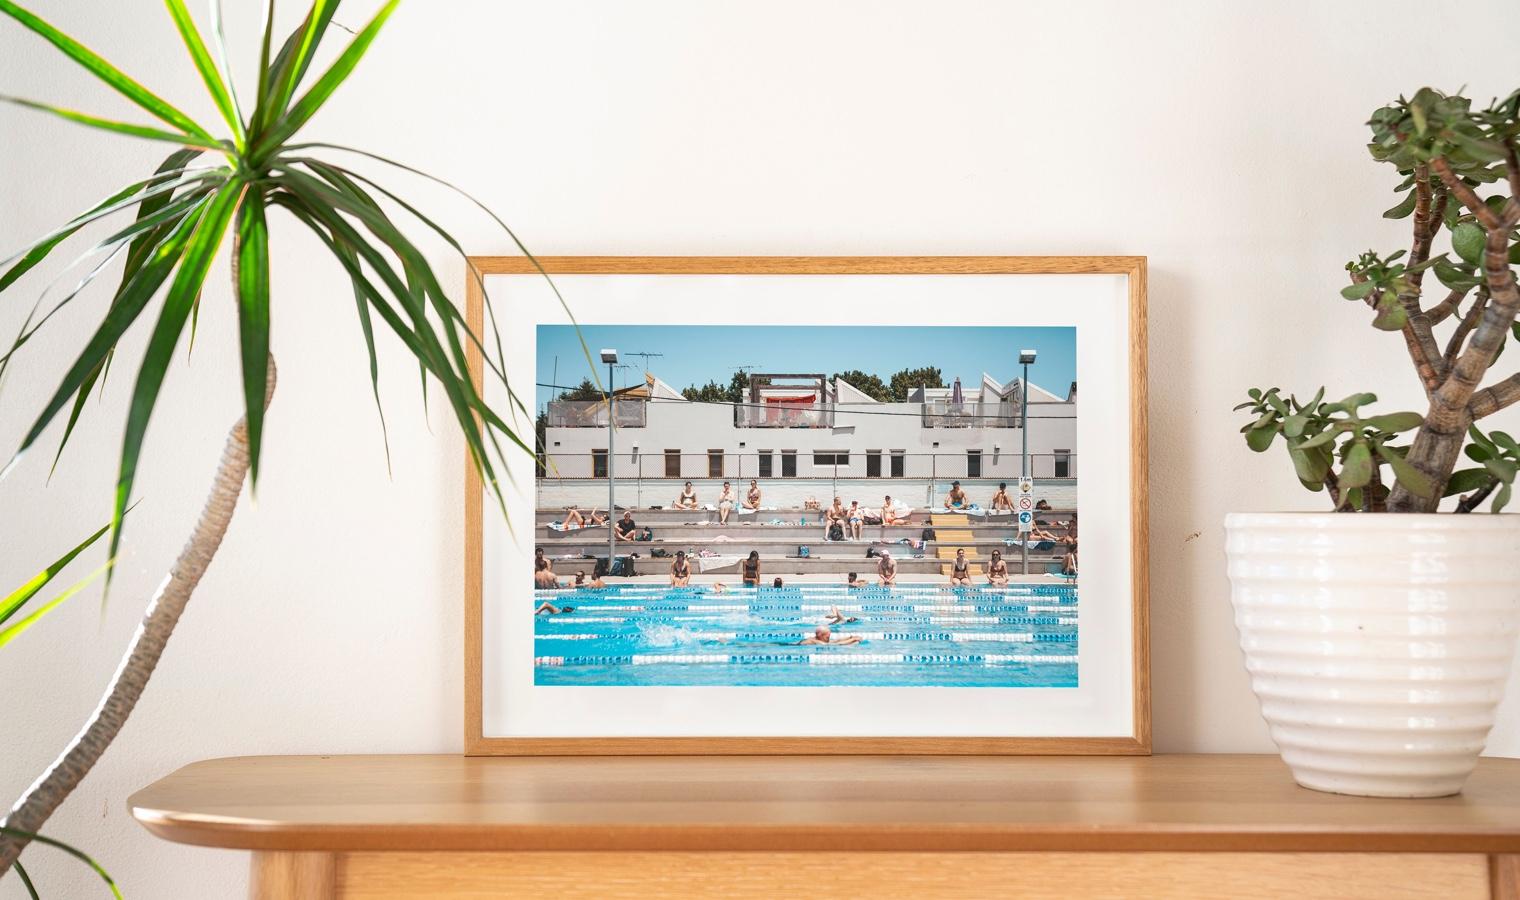 places-we-swim-prints-ethical-design-agency-sustainable-brands-graphic-designer-sydney-byron-bay-bondi-melbourne-branding-plant.jpg